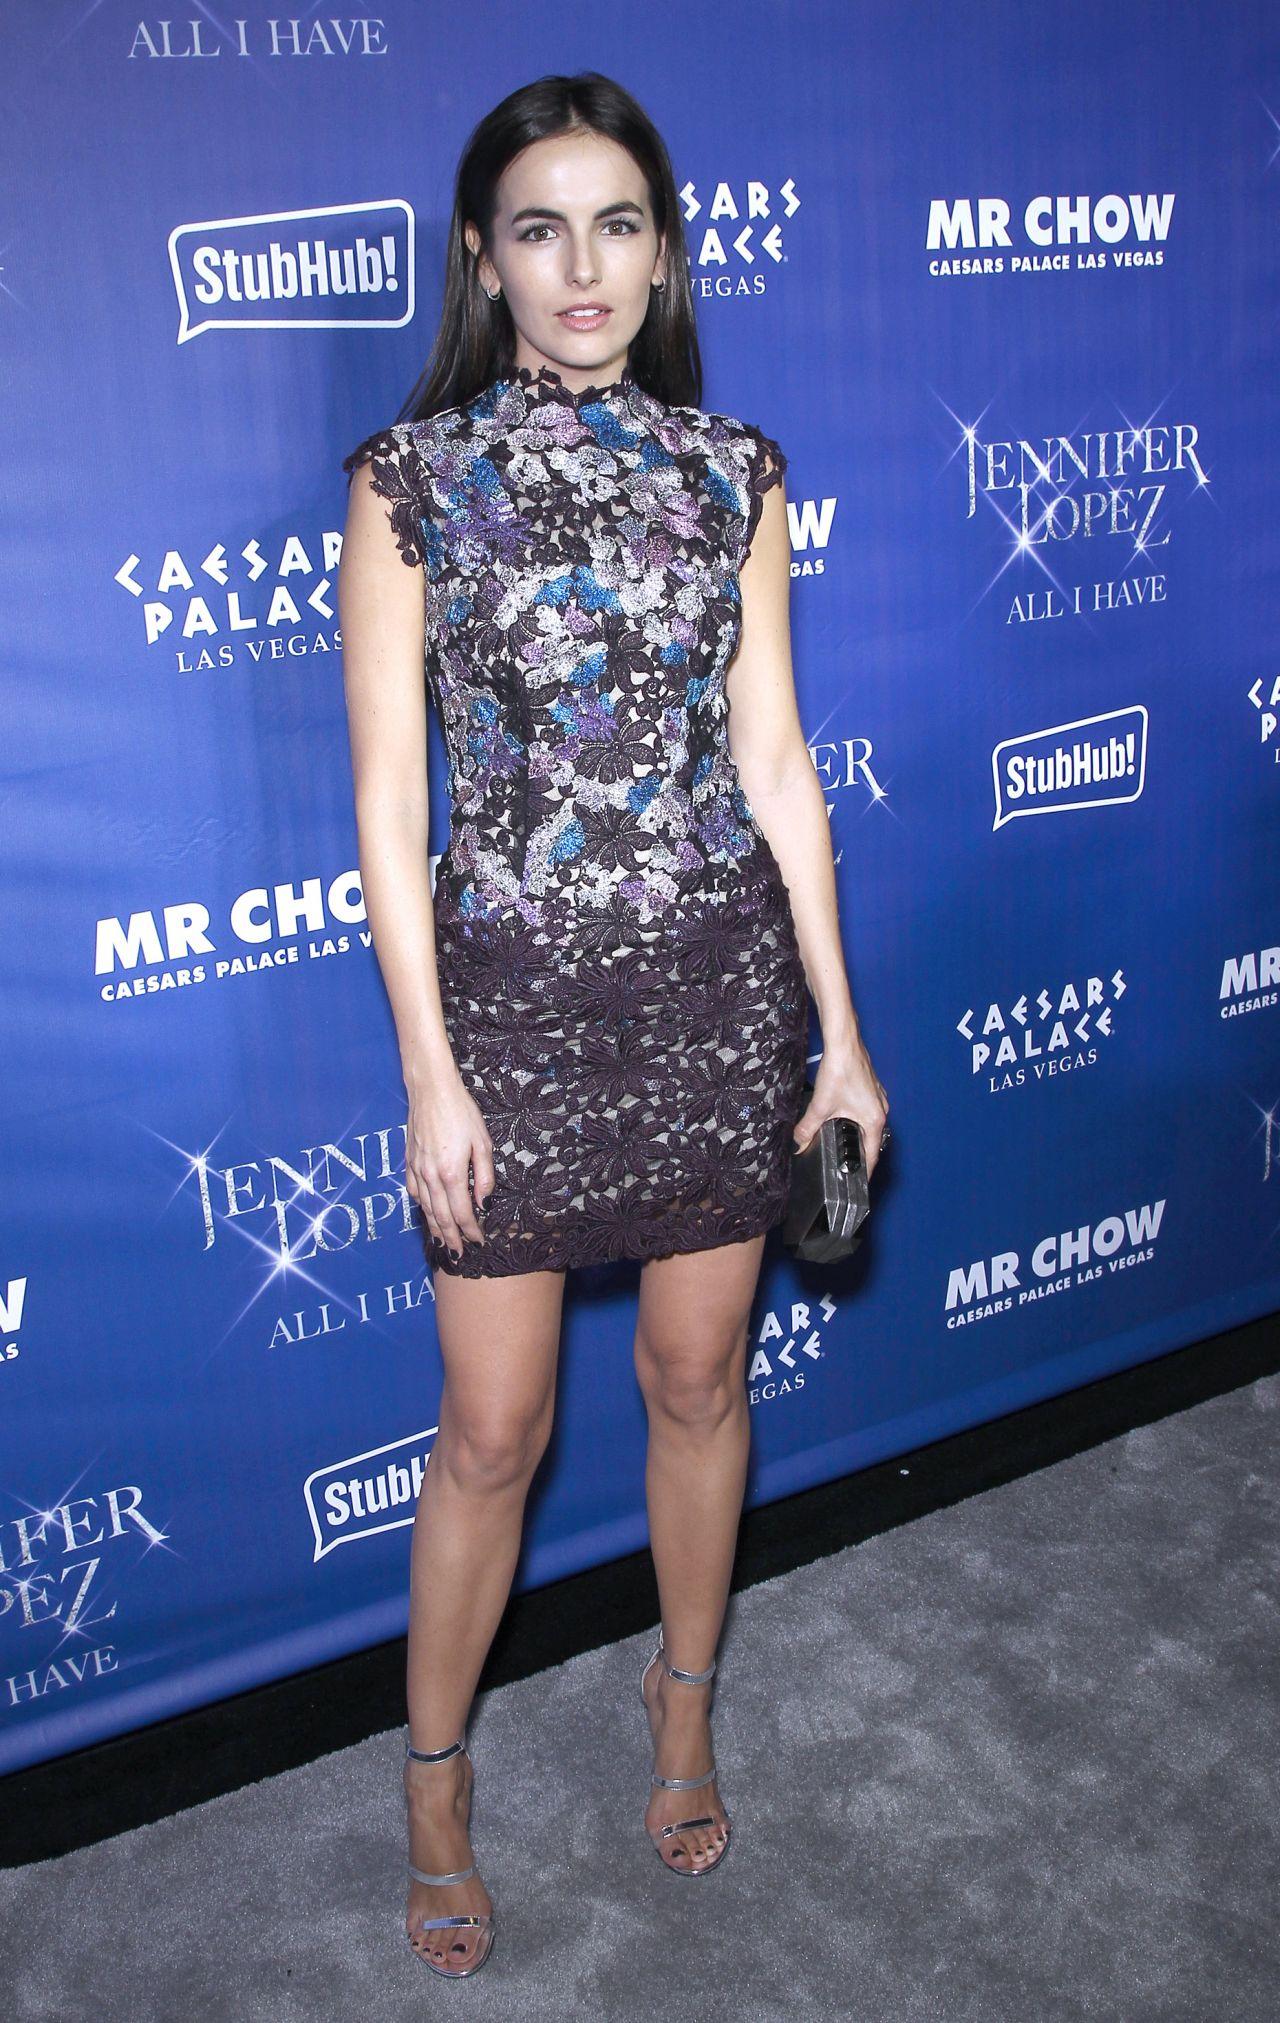 Camilla Belle Jennifer Lopez S All I Have Residency